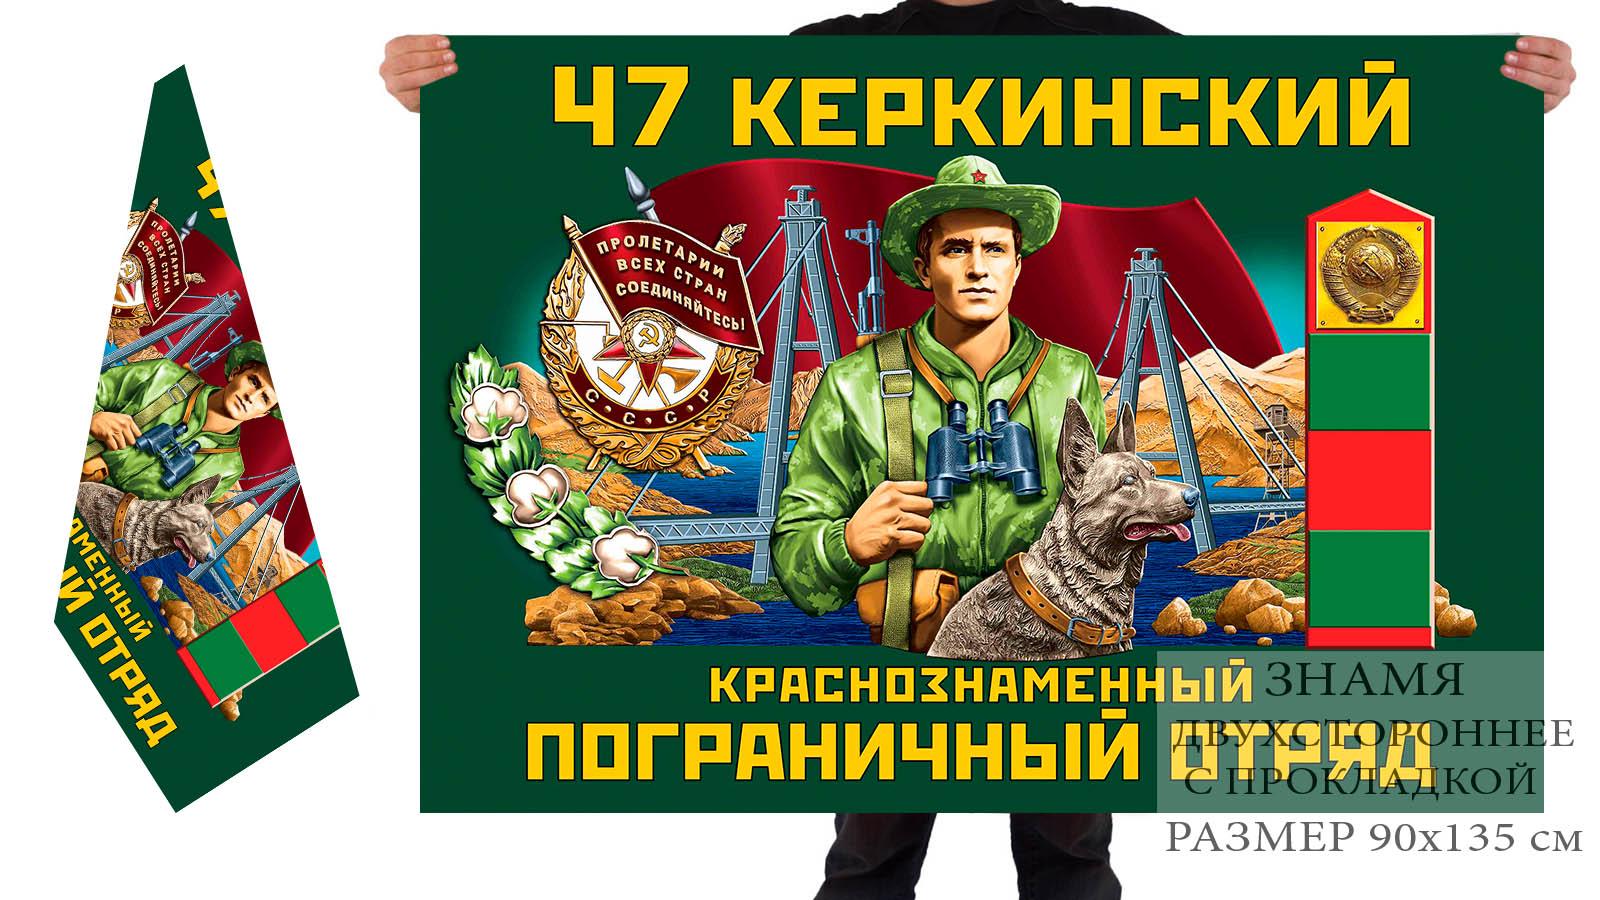 Двусторонний флаг 47 Керкинского Краснознамённого погранотряда